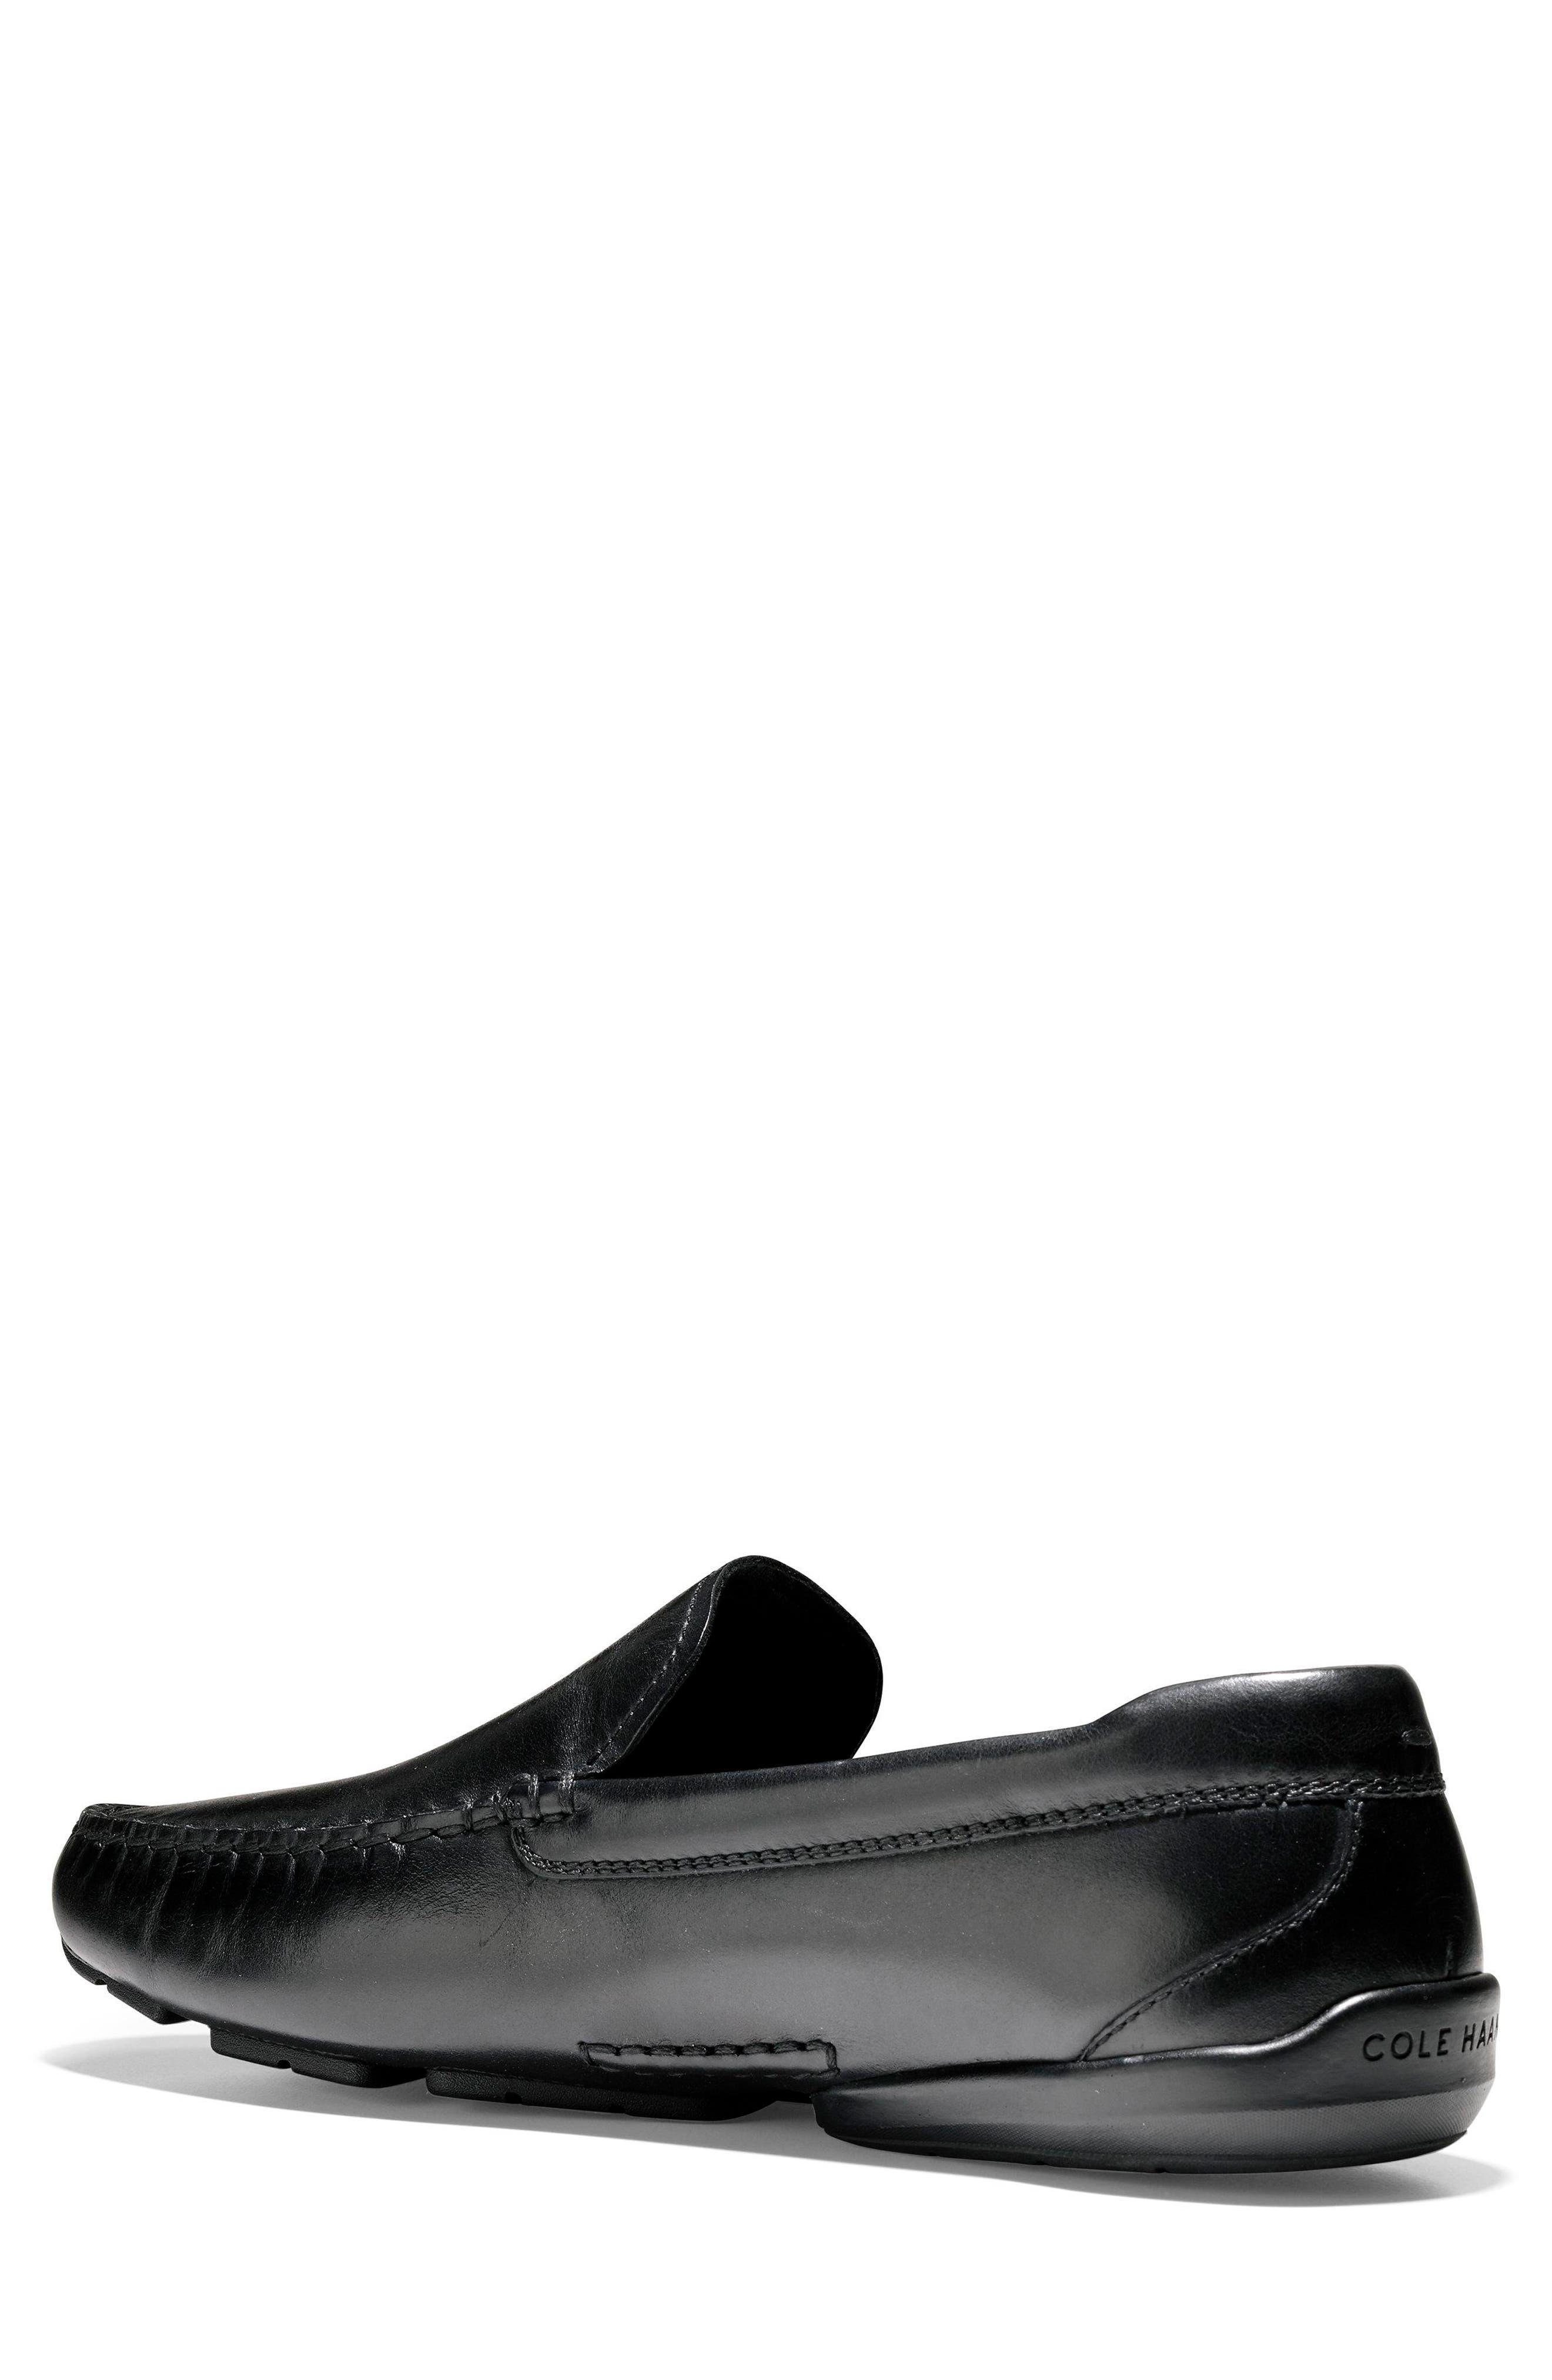 Branson Driving Shoe,                             Alternate thumbnail 2, color,                             001